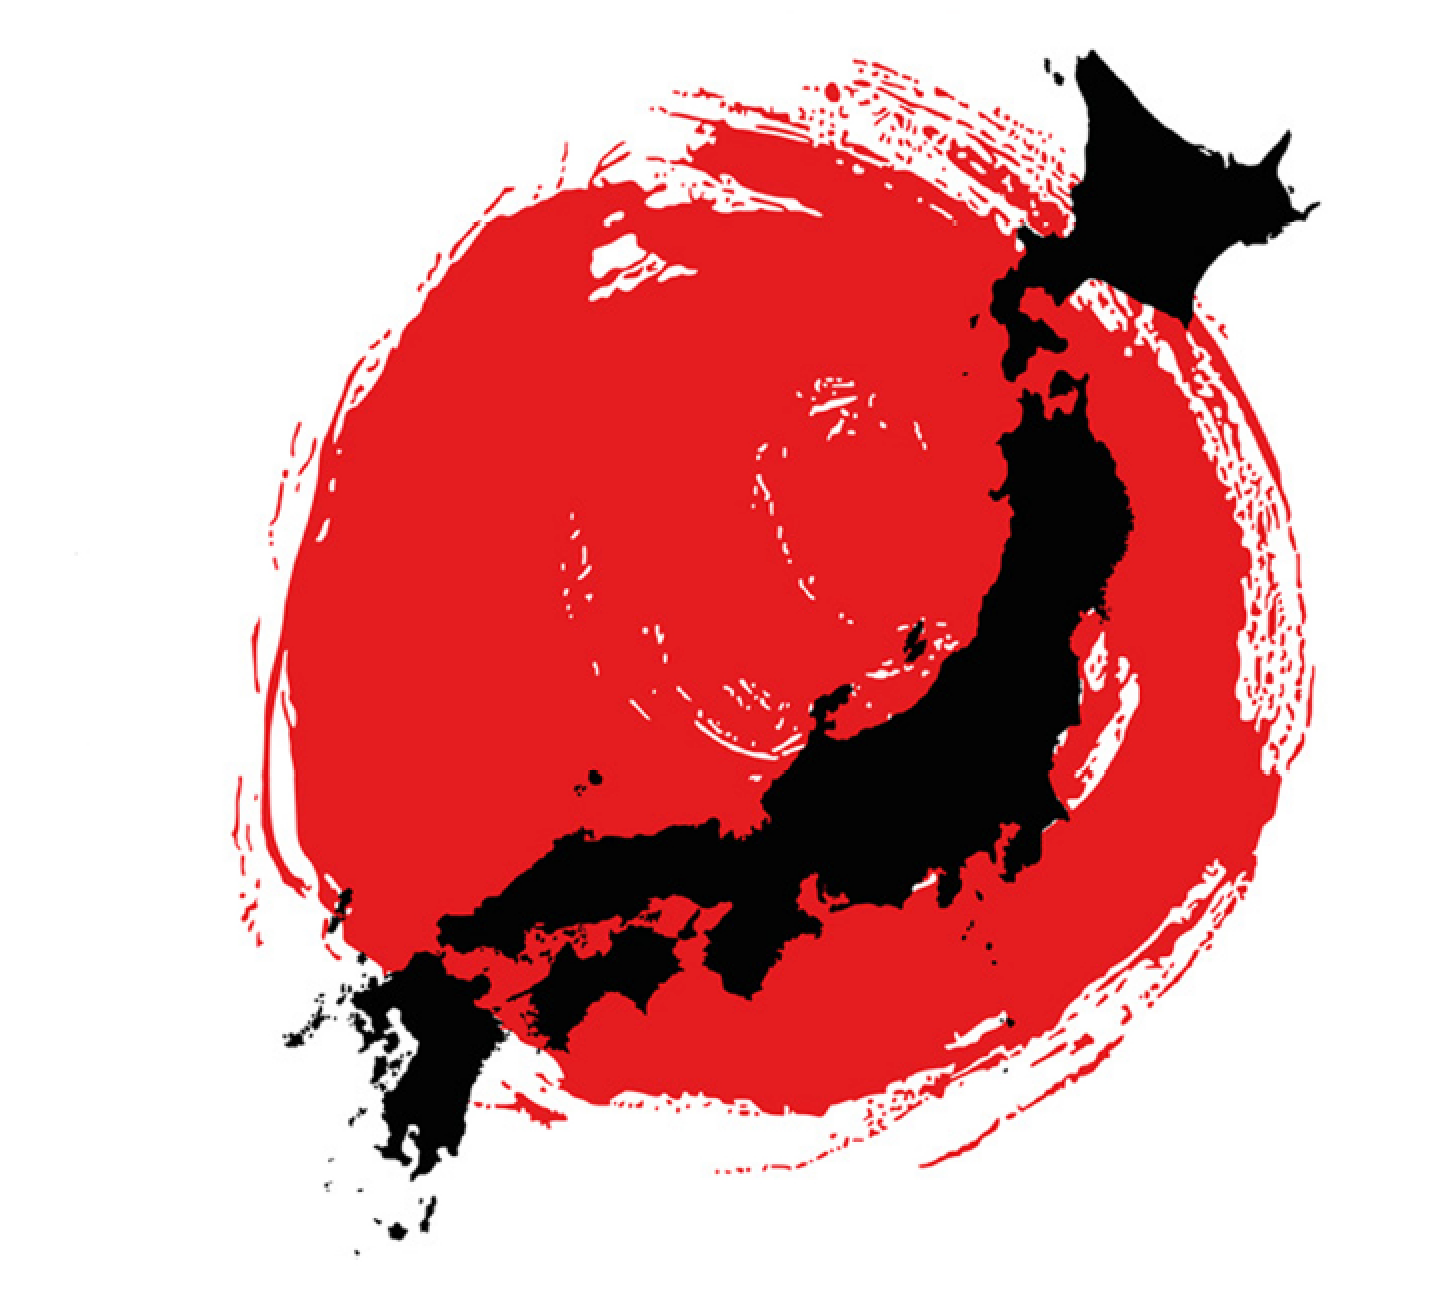 Pin Oleh Matthew Phillips Di All Things Japan Bendera Jepang